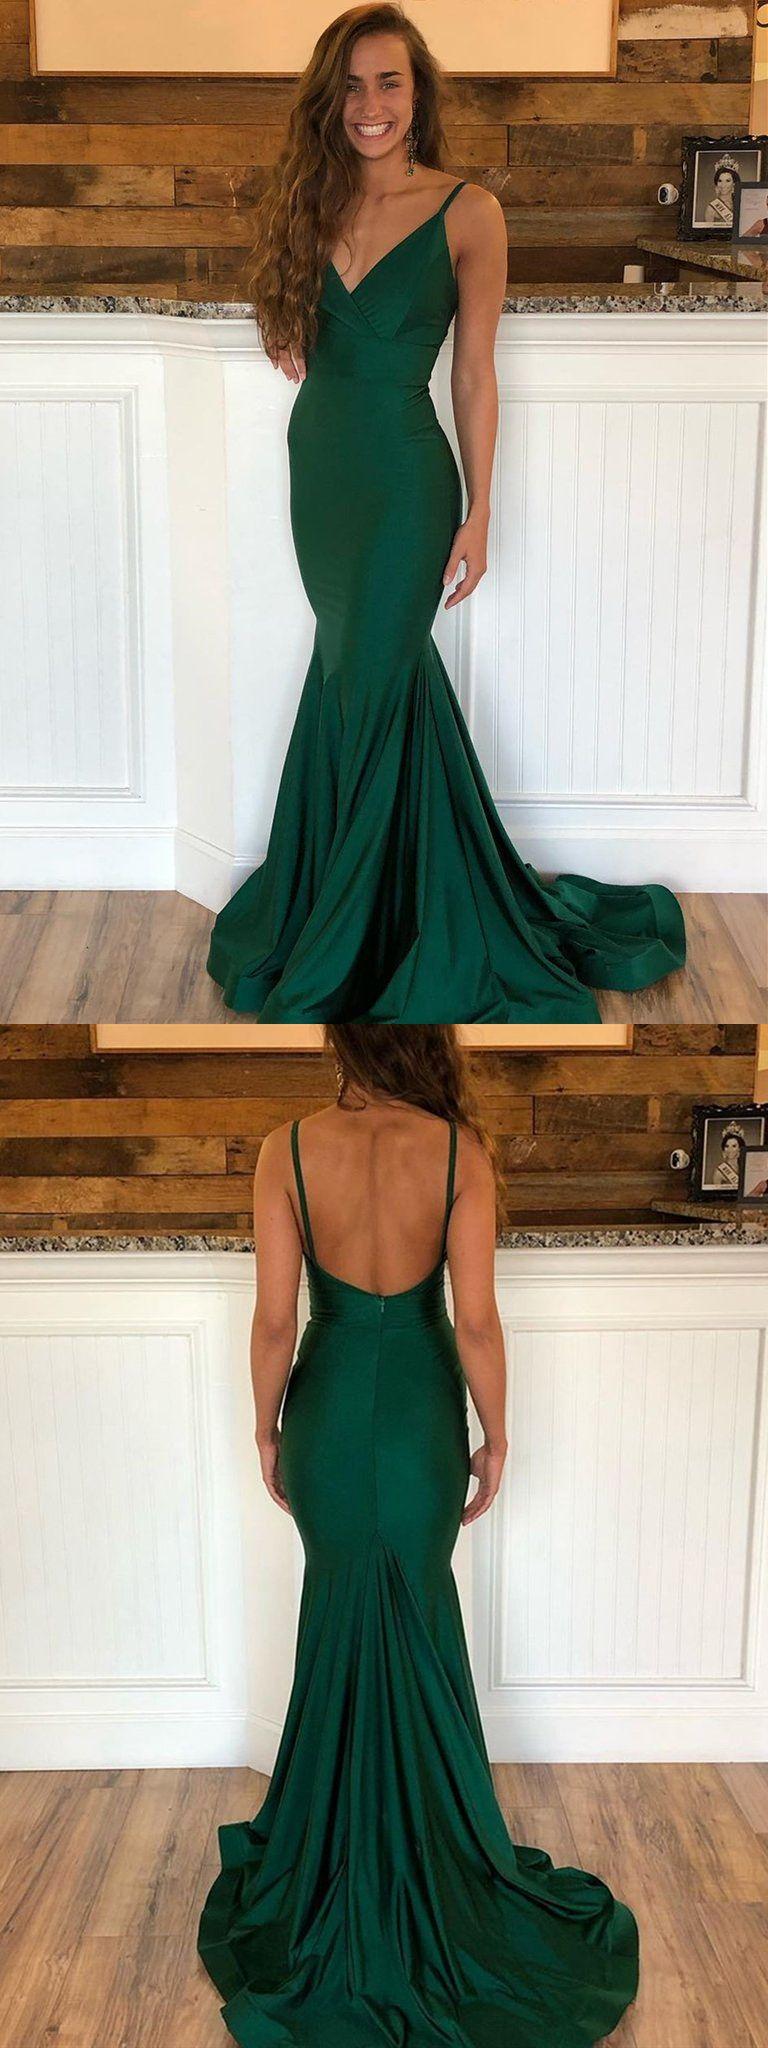 Emerald Green V Neck Mermaid Backless Long Prom Dresses With Sweep Train Emerald Green Mermaid Formal Graduation Evening Dresses Green Formal Dresses Emerald Green Prom Dress Green Prom Dress [ 2048 x 768 Pixel ]